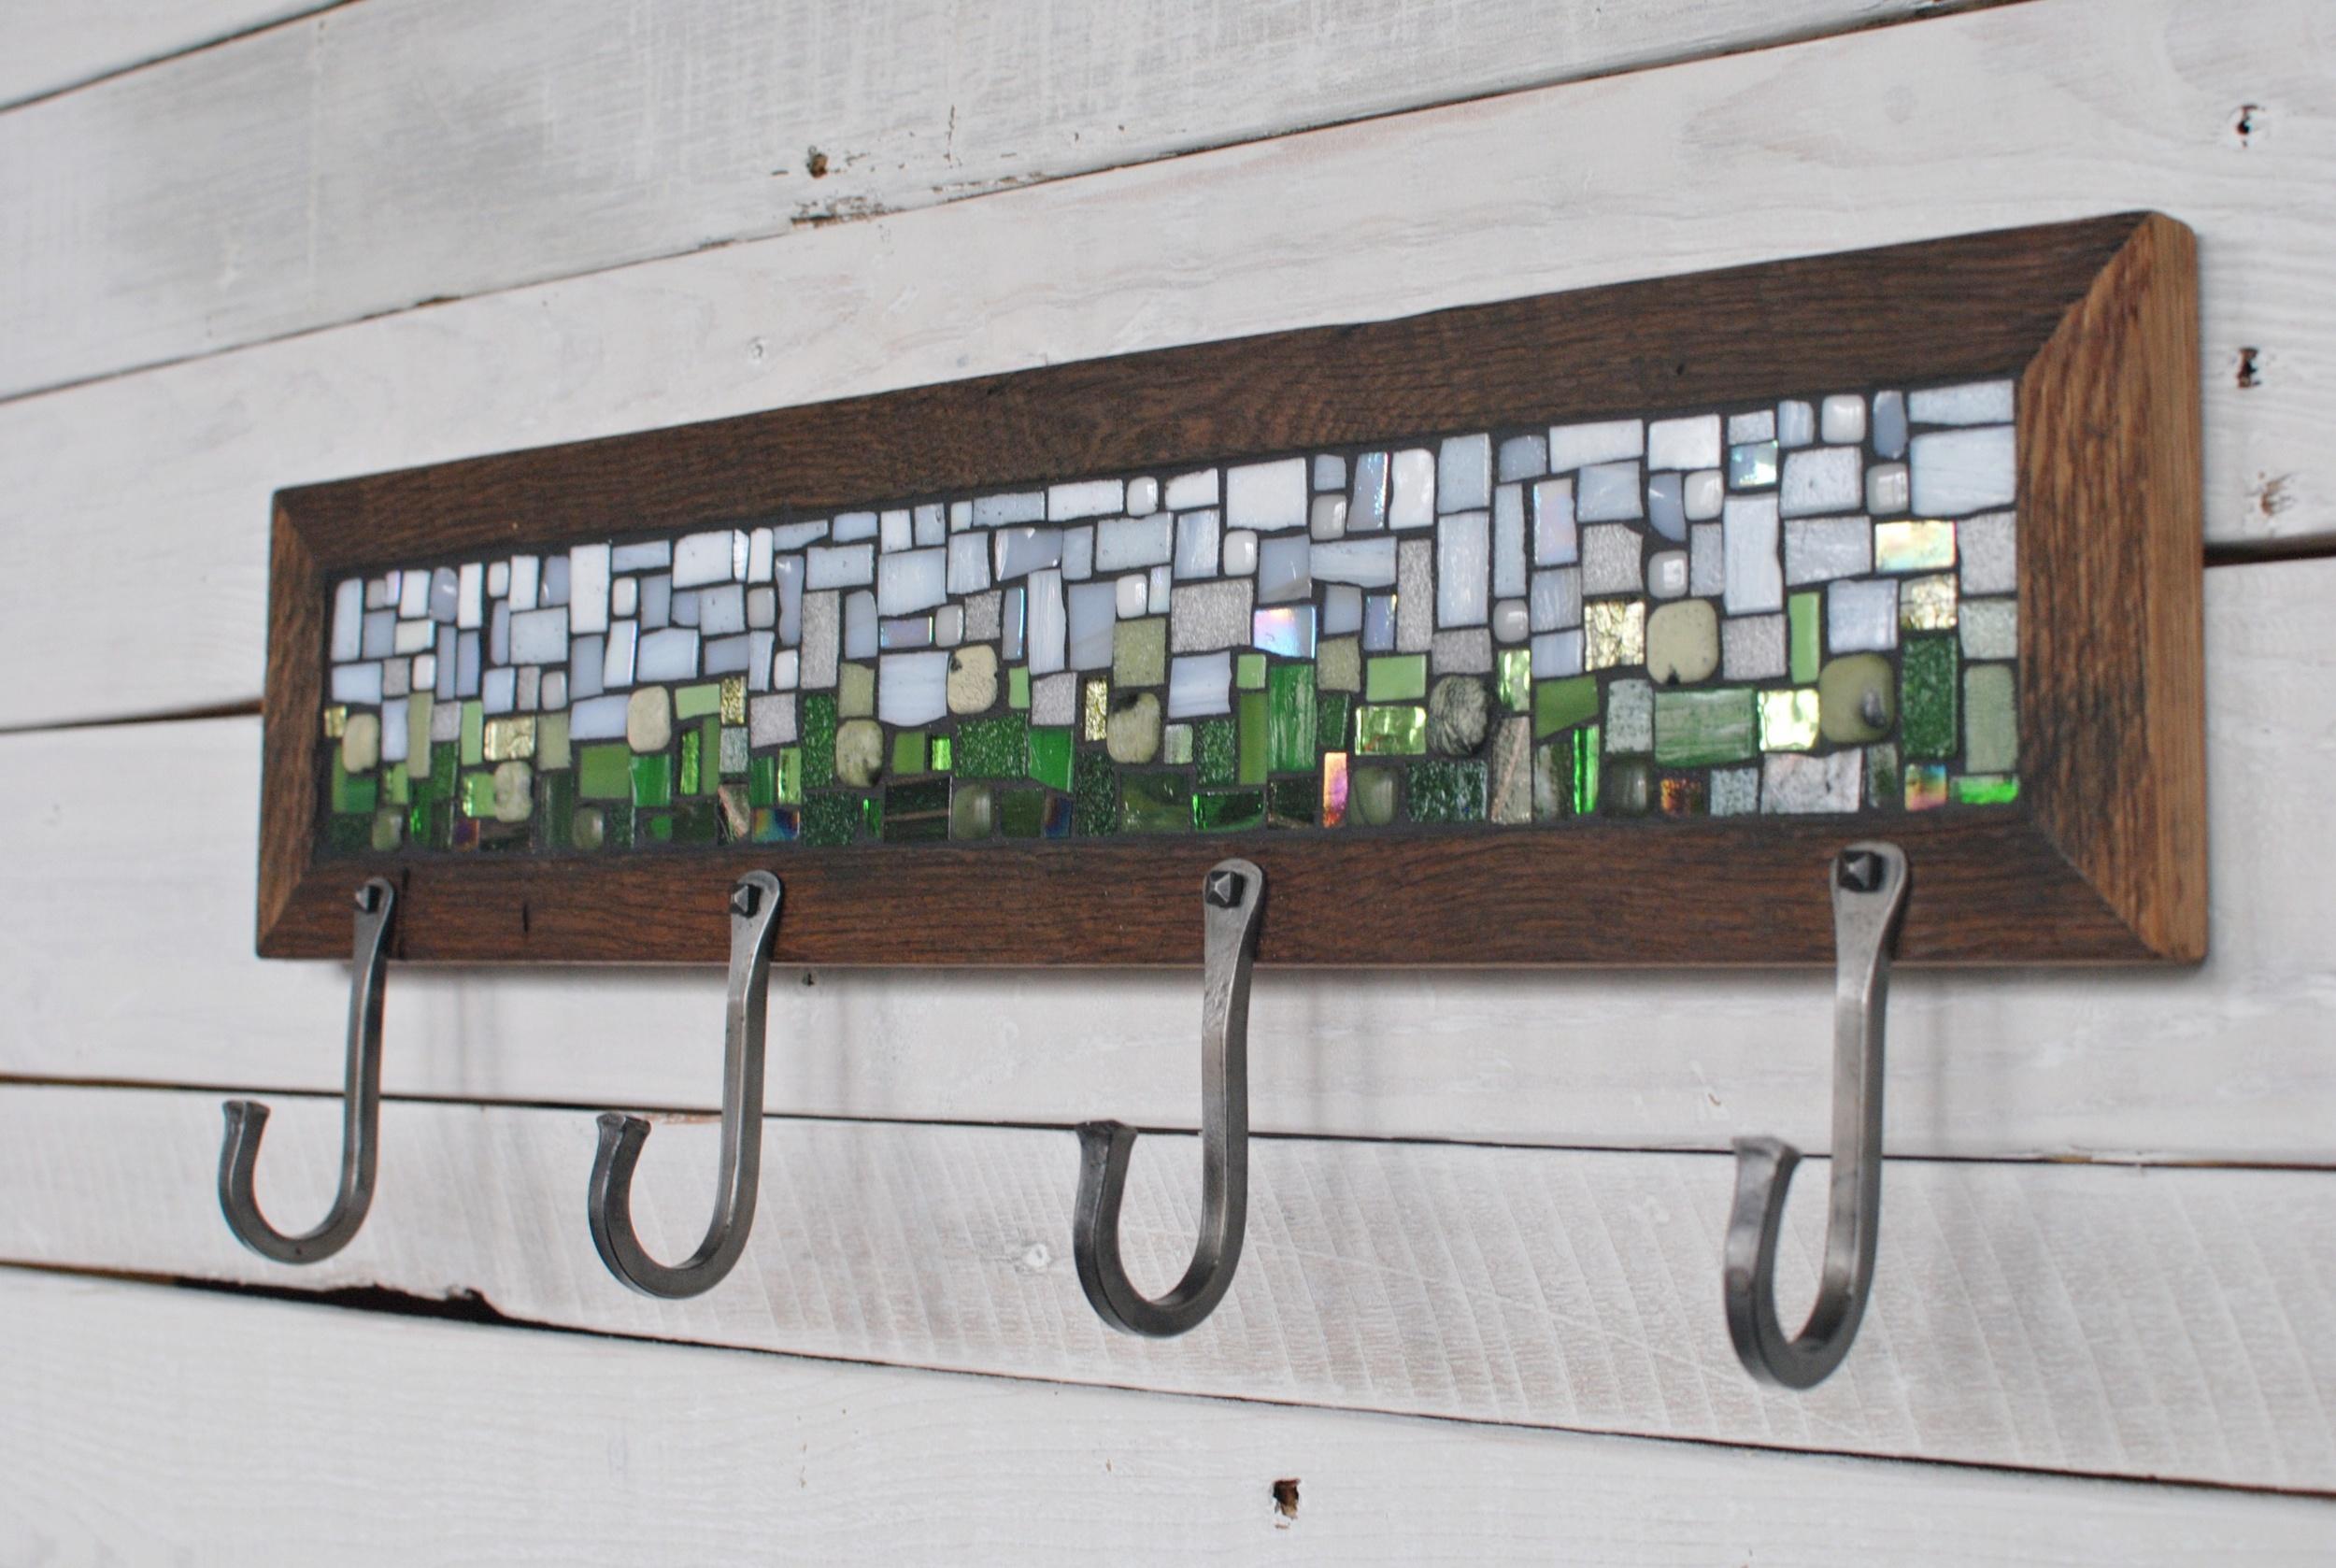 Green-coat-rack-PH2013-1.JPG